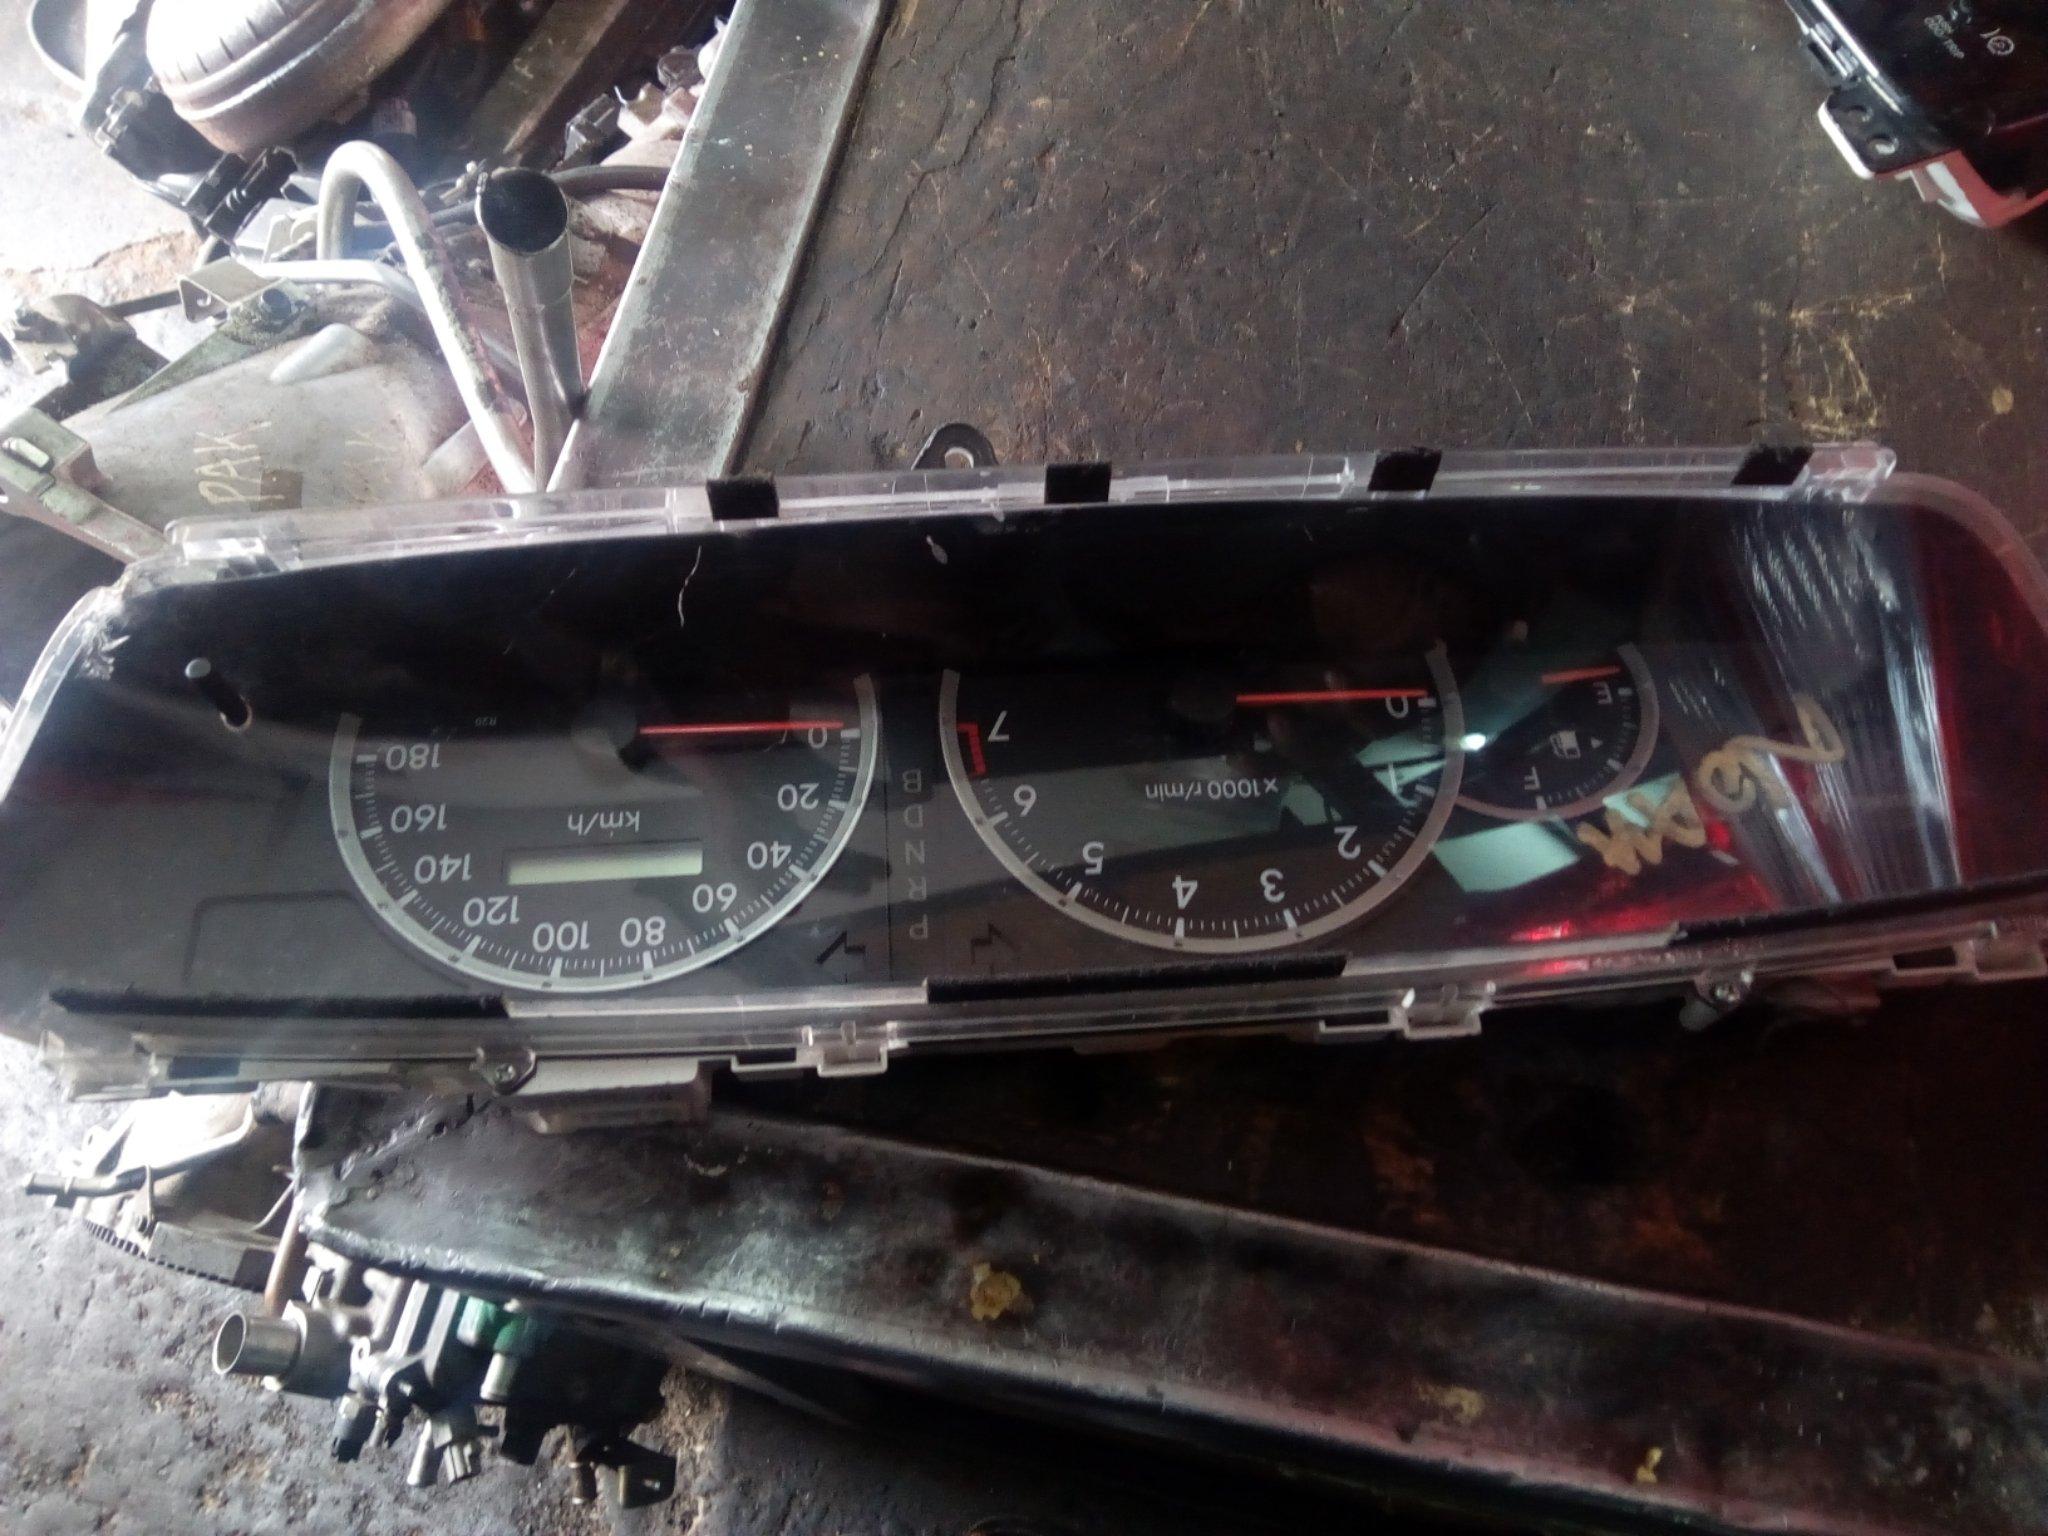 Toyota Noah spedometar 00604